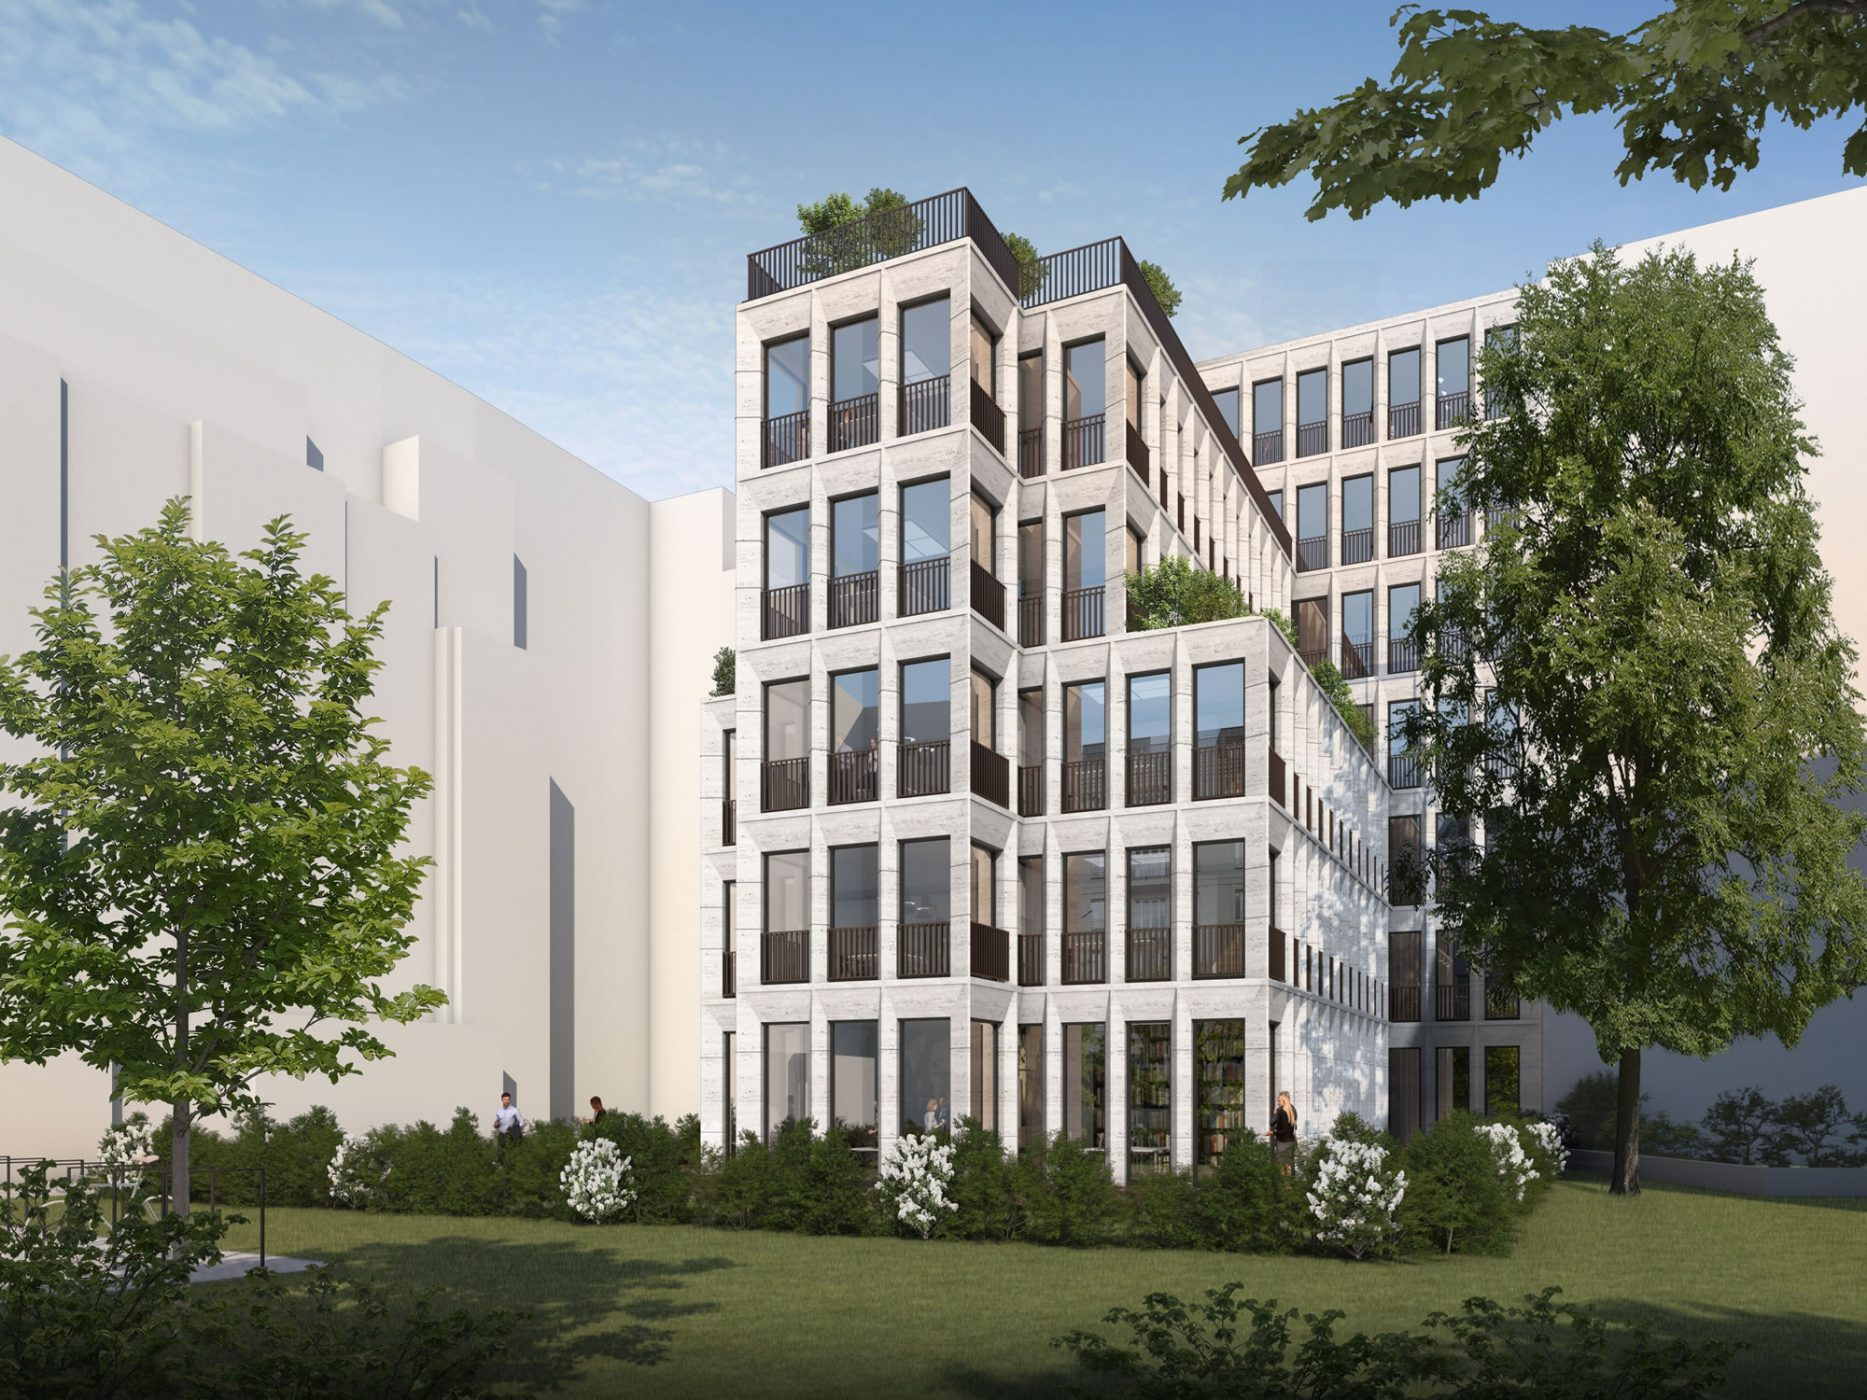 FREO Group - Seydelstrasse_7170_210215_V_Seydelstrasse Berlin_eckig_A_Hof_Kam2